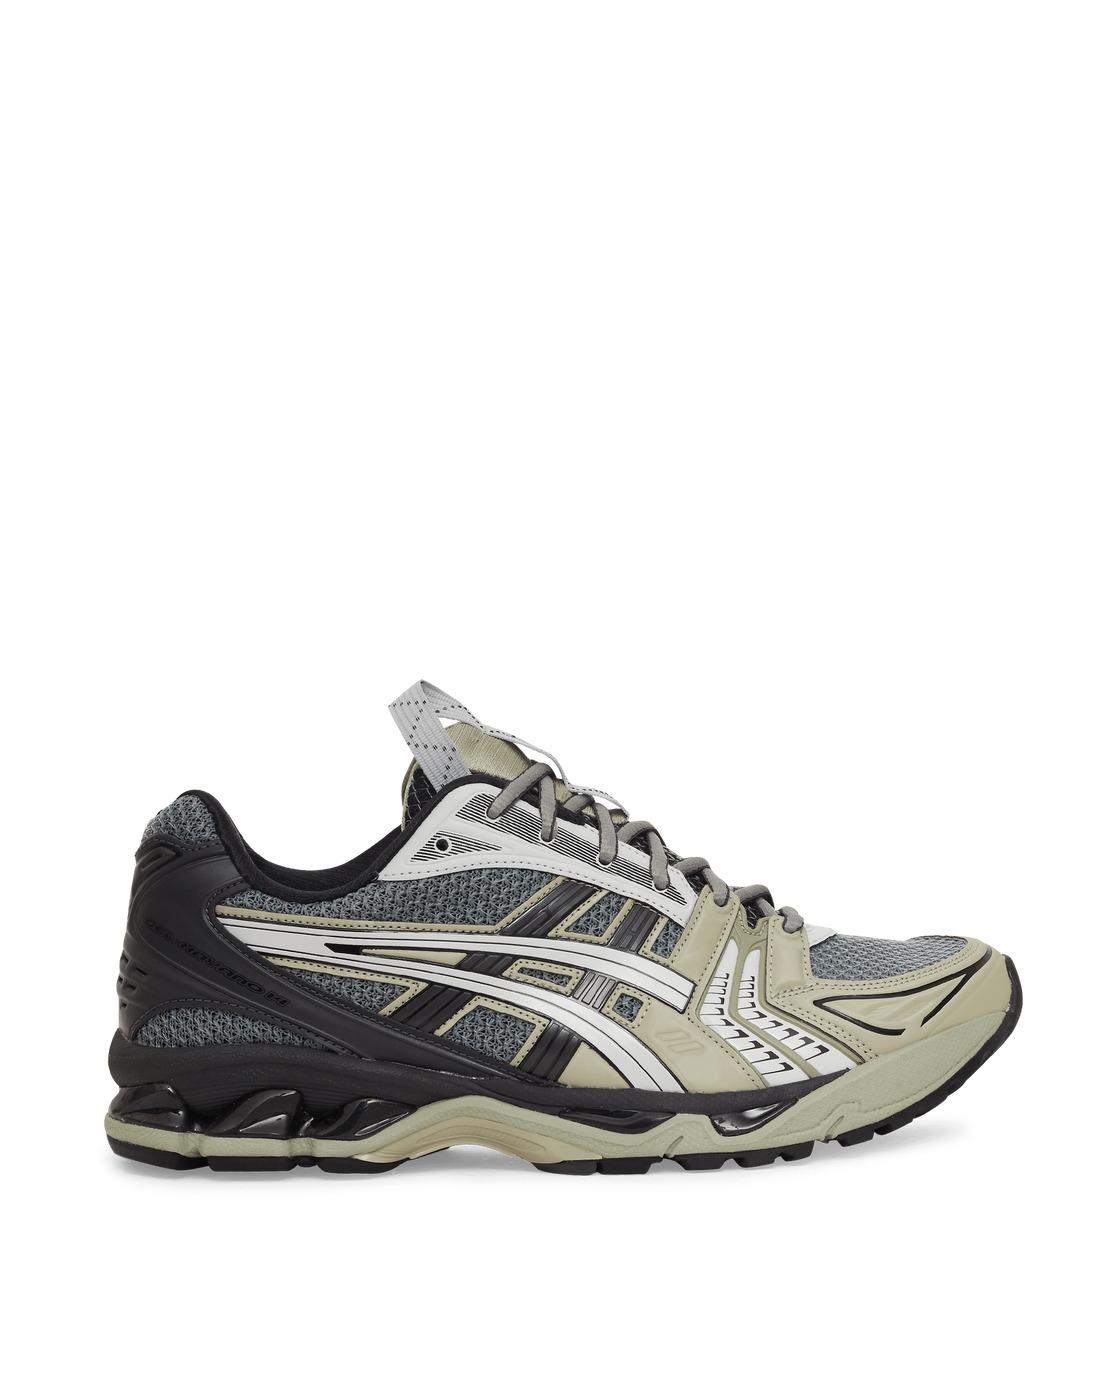 Asics Ub1 S Gel Kayano 14 Sneakers Piedmont Grey/Graphite Grey